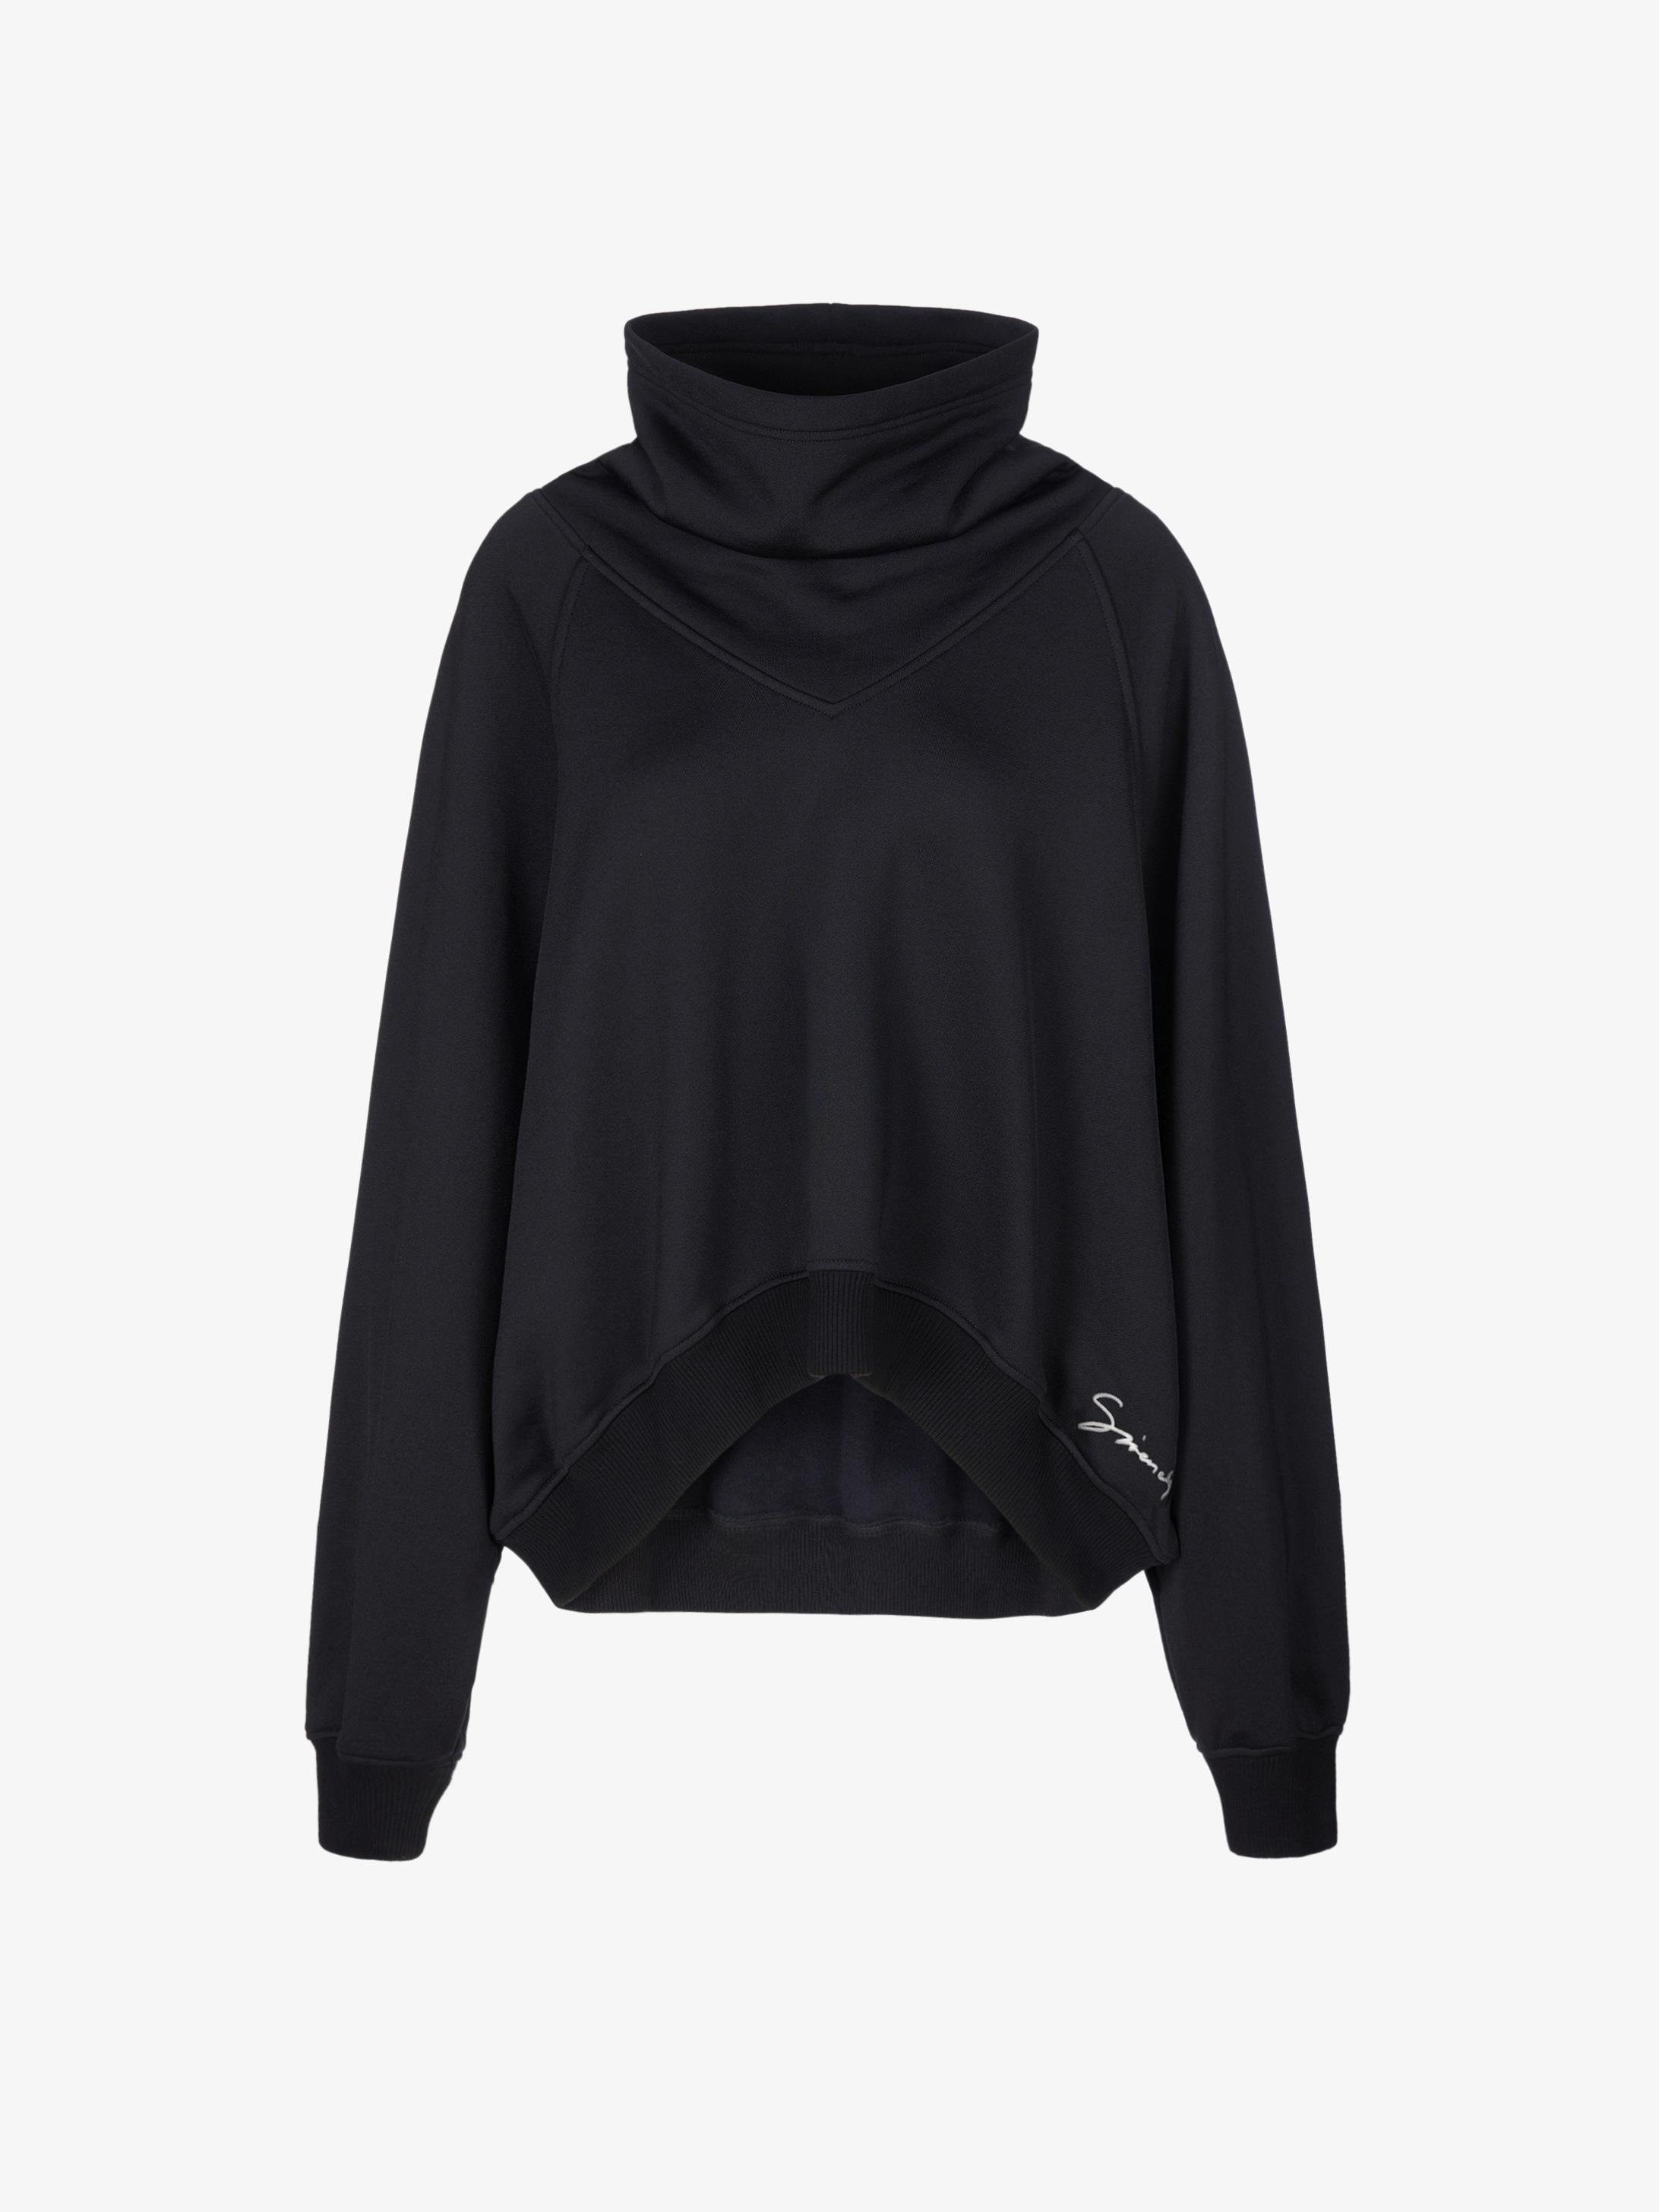 GIVENCHY oversized raglan sweatshirt with funnel collar